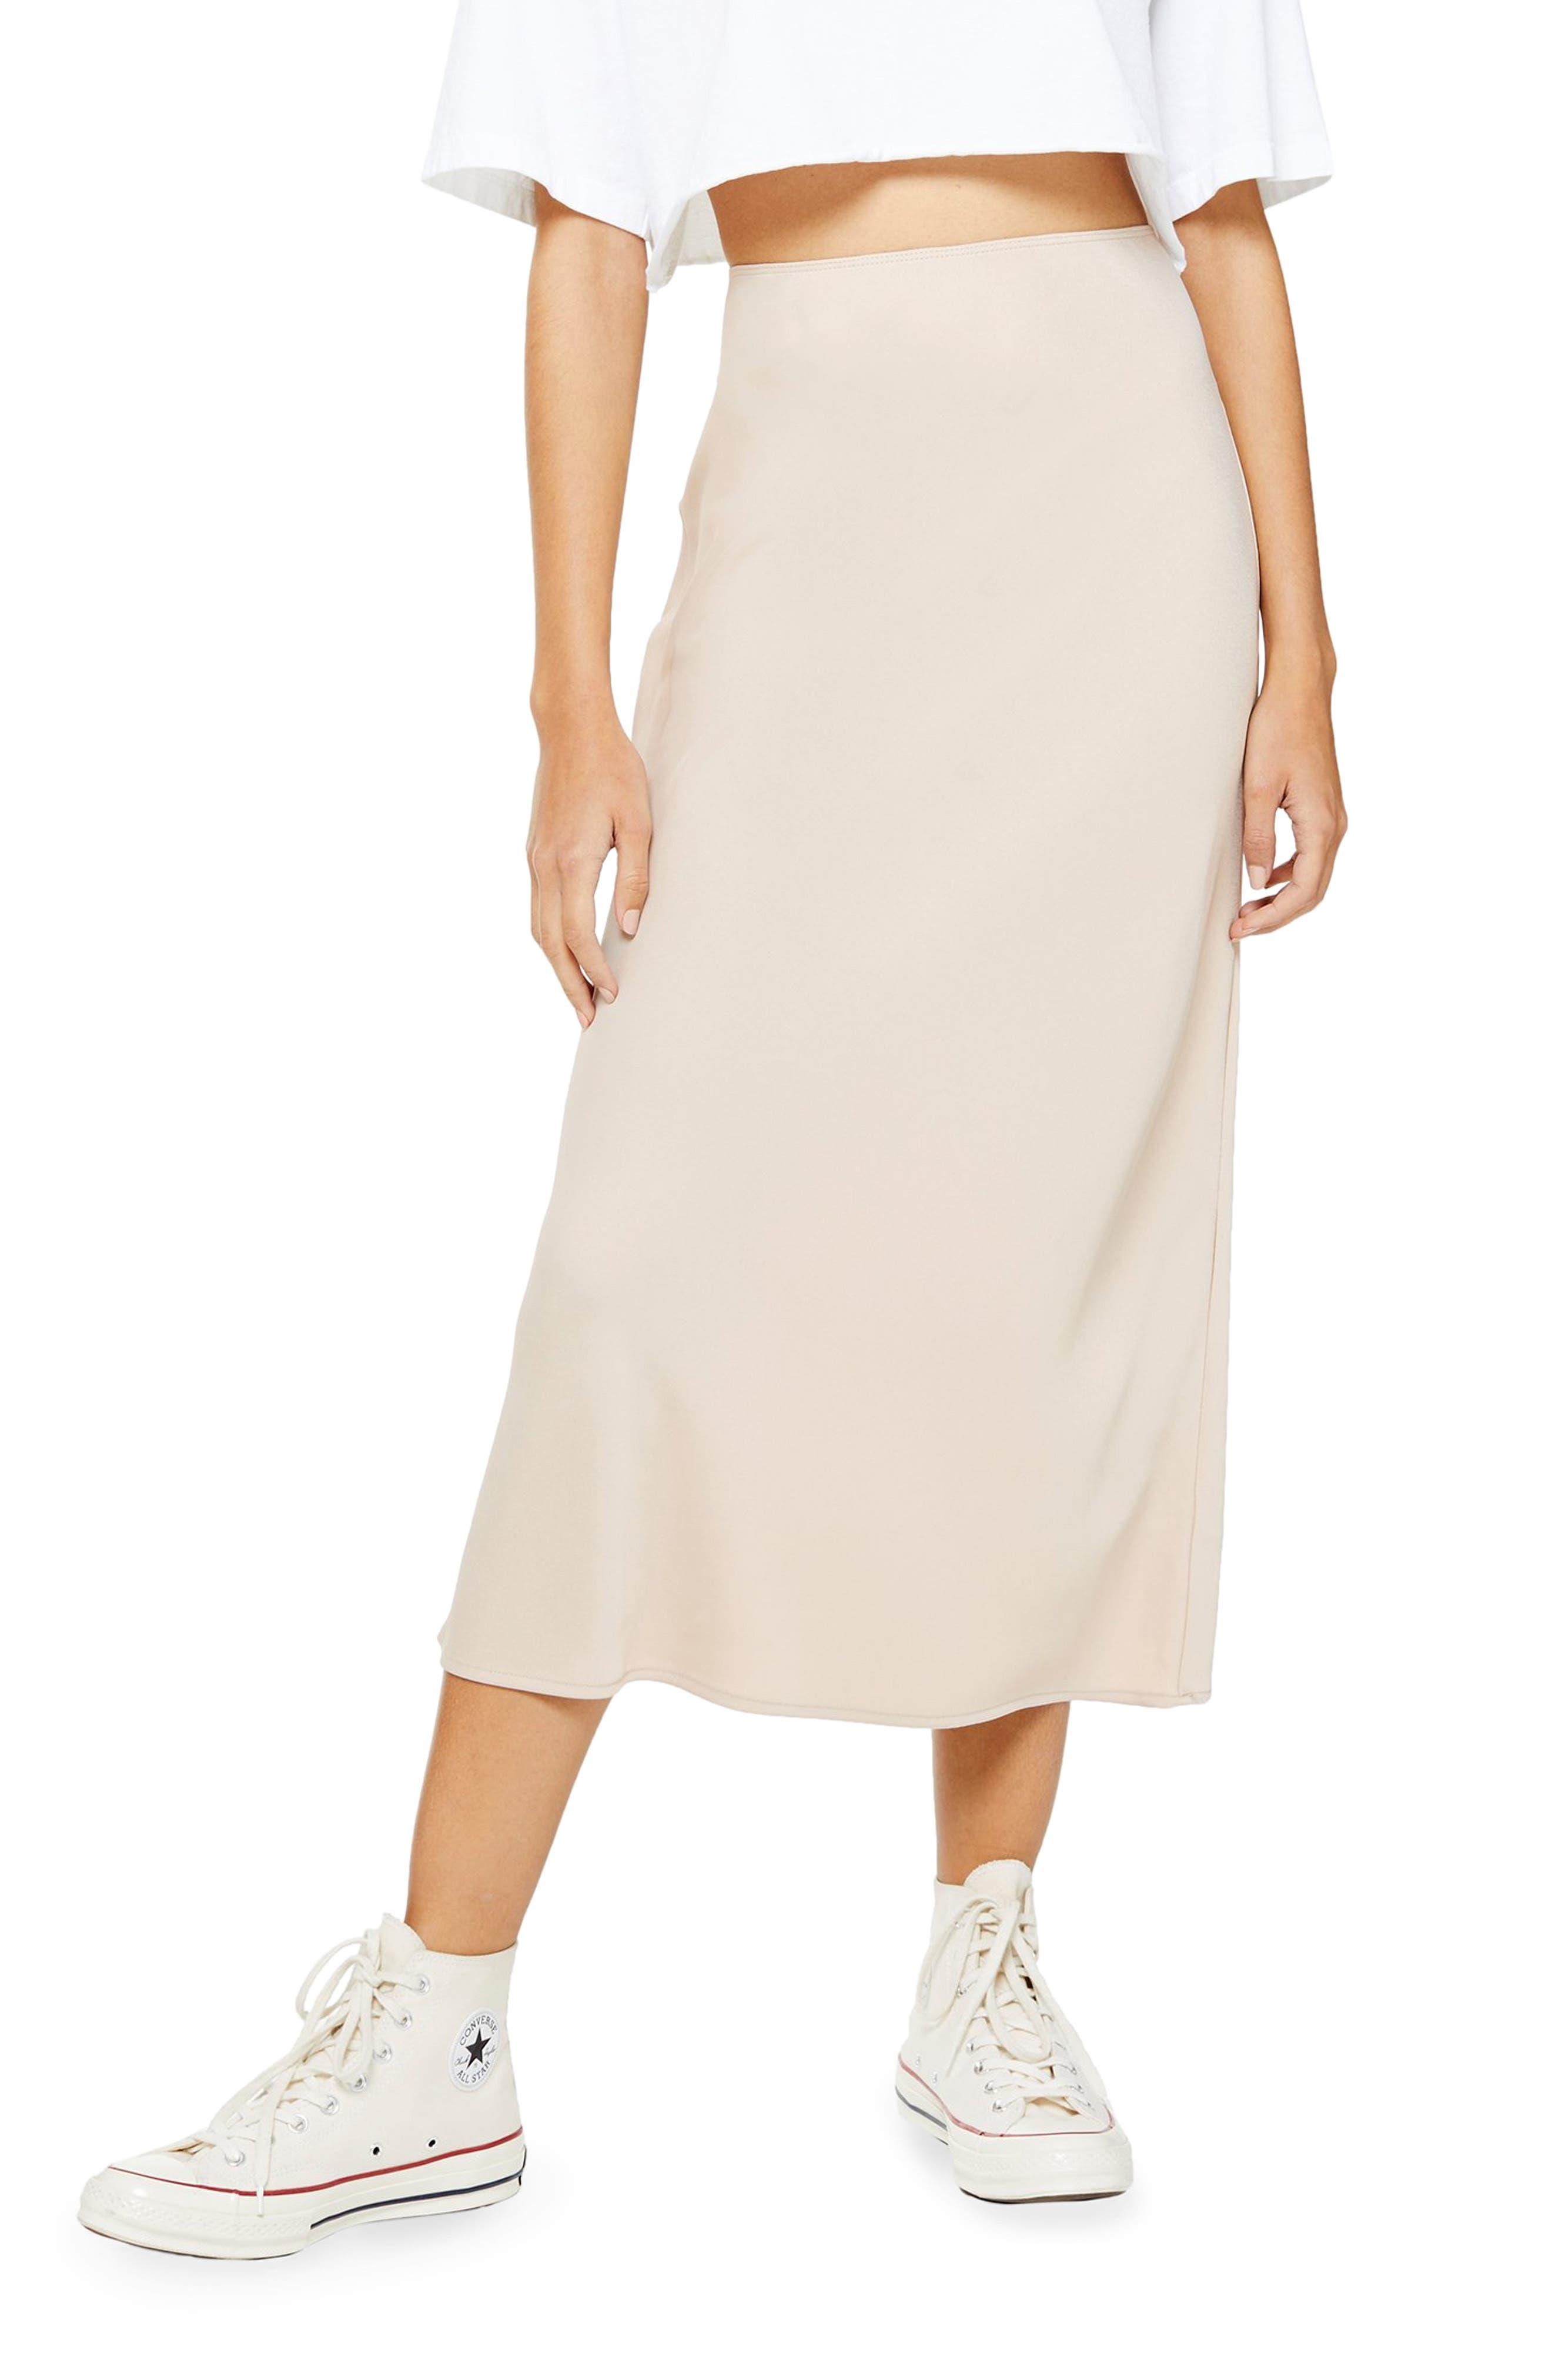 Topshop Matte Satin Bias Cut Skirt